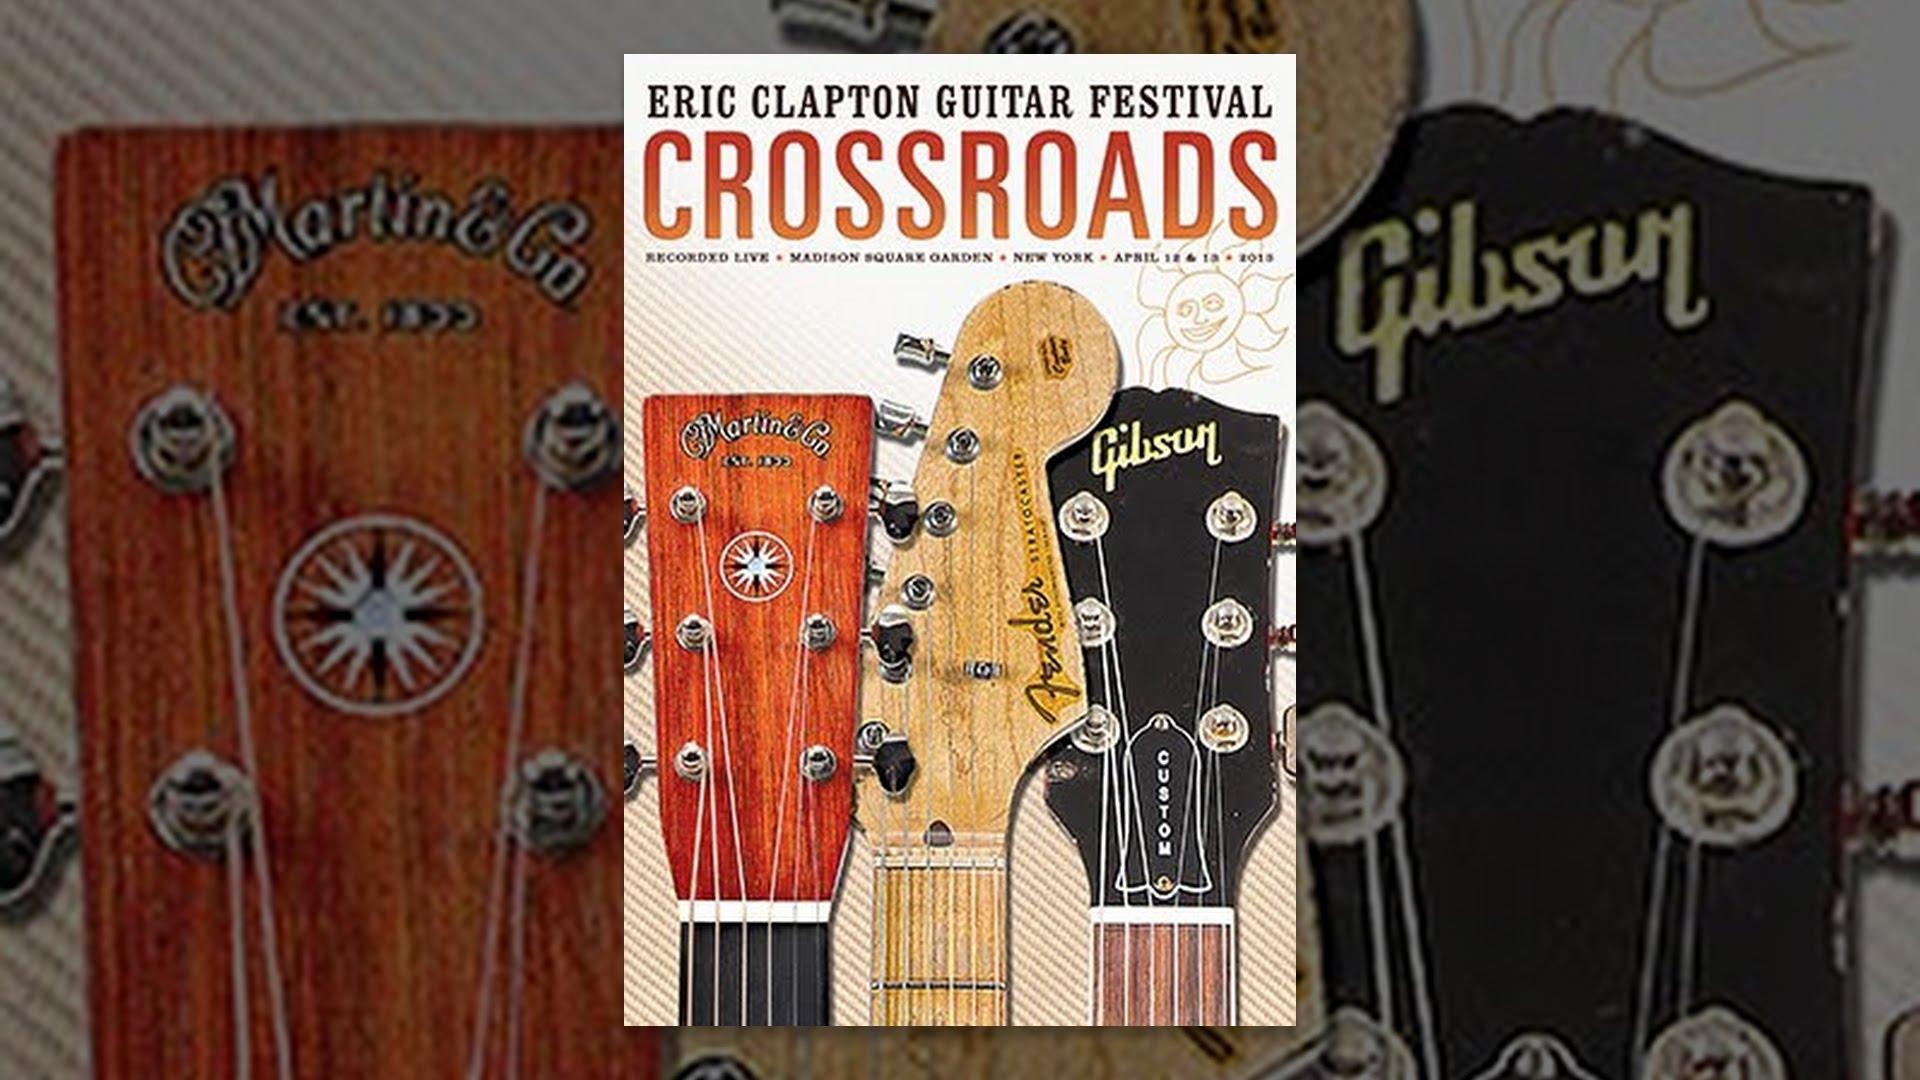 eric clapton crossroads guitar festival 2013 youtube. Black Bedroom Furniture Sets. Home Design Ideas